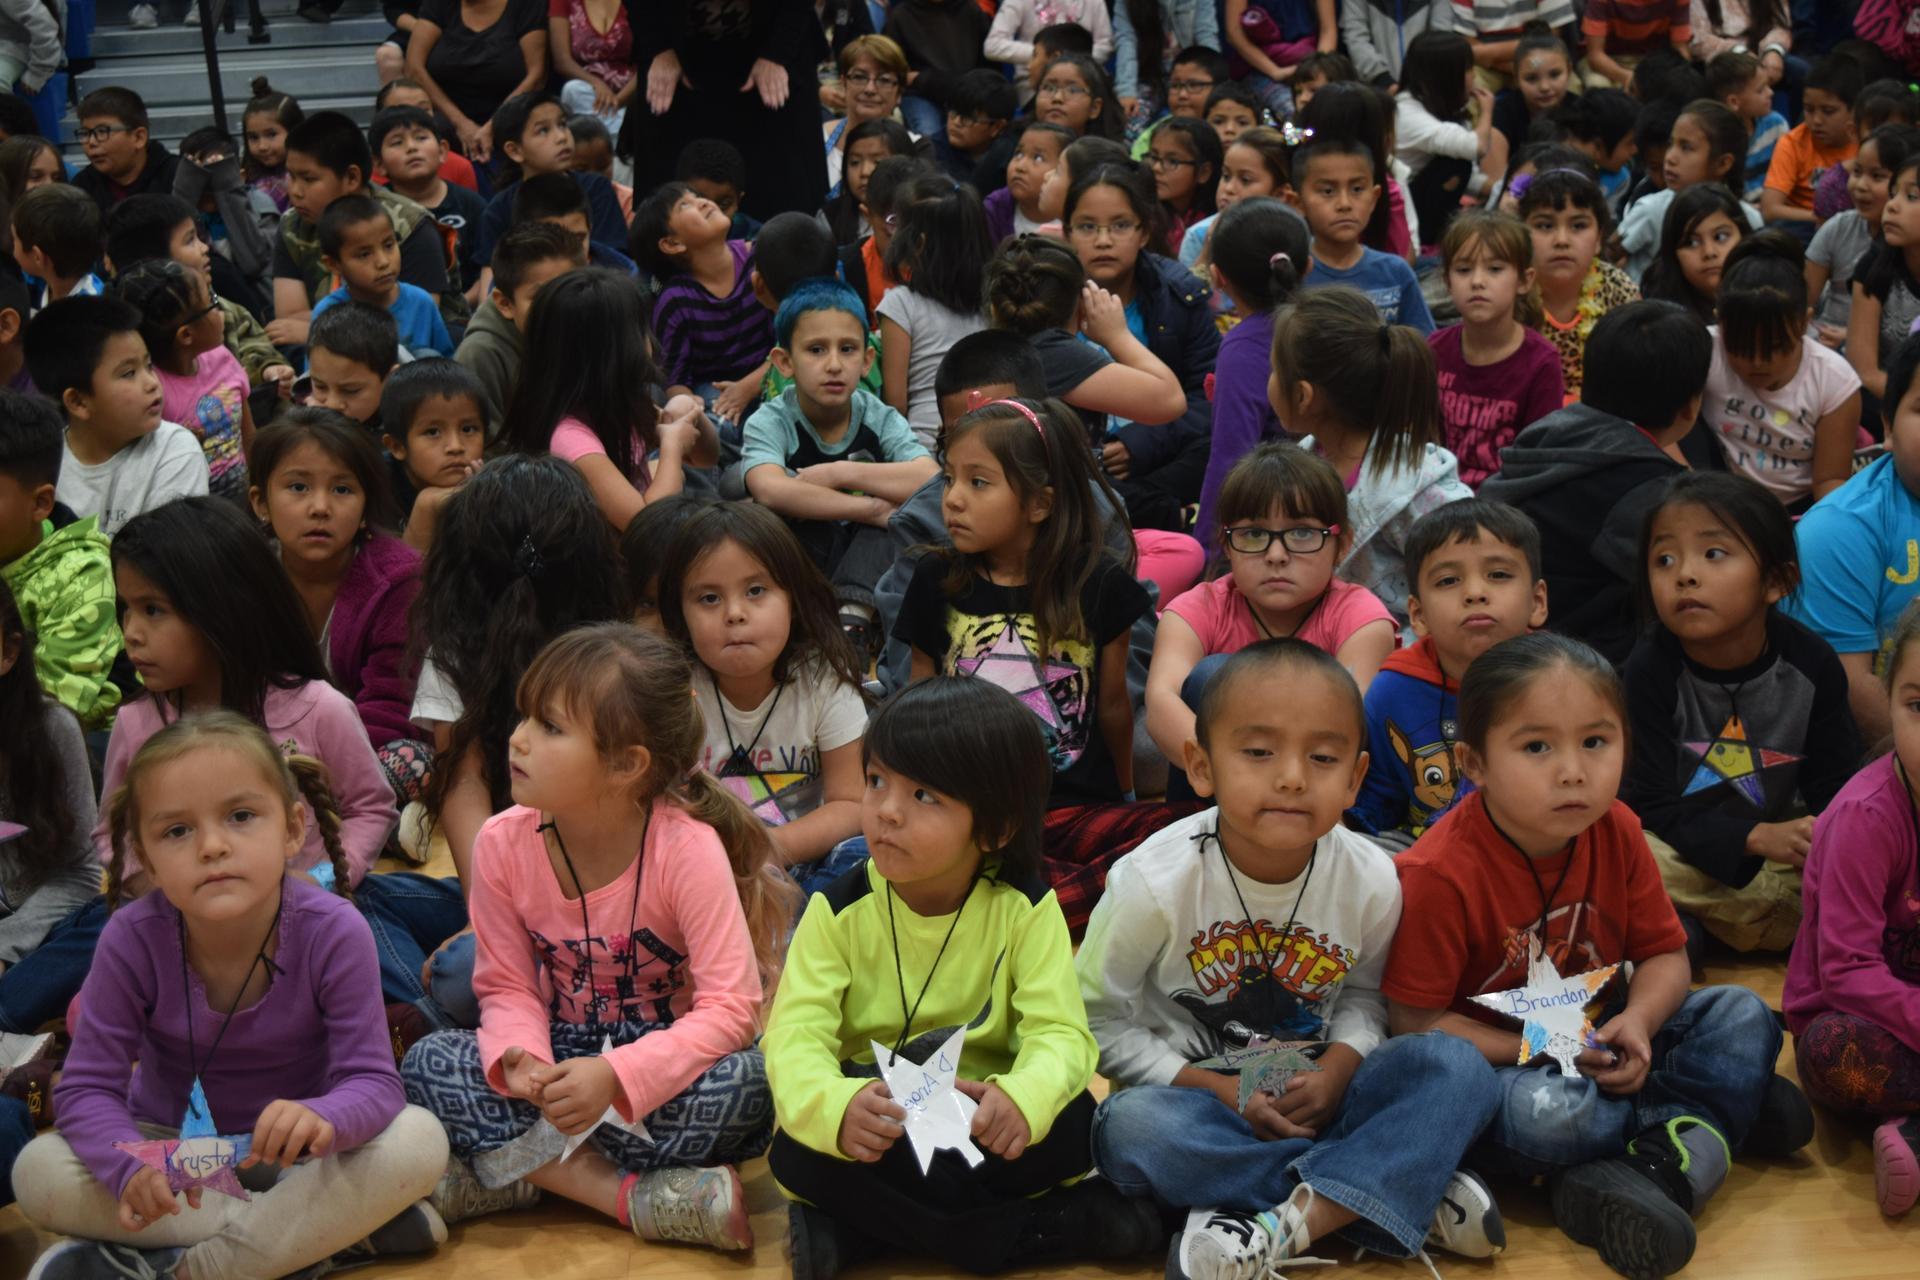 Elementary kids sitting